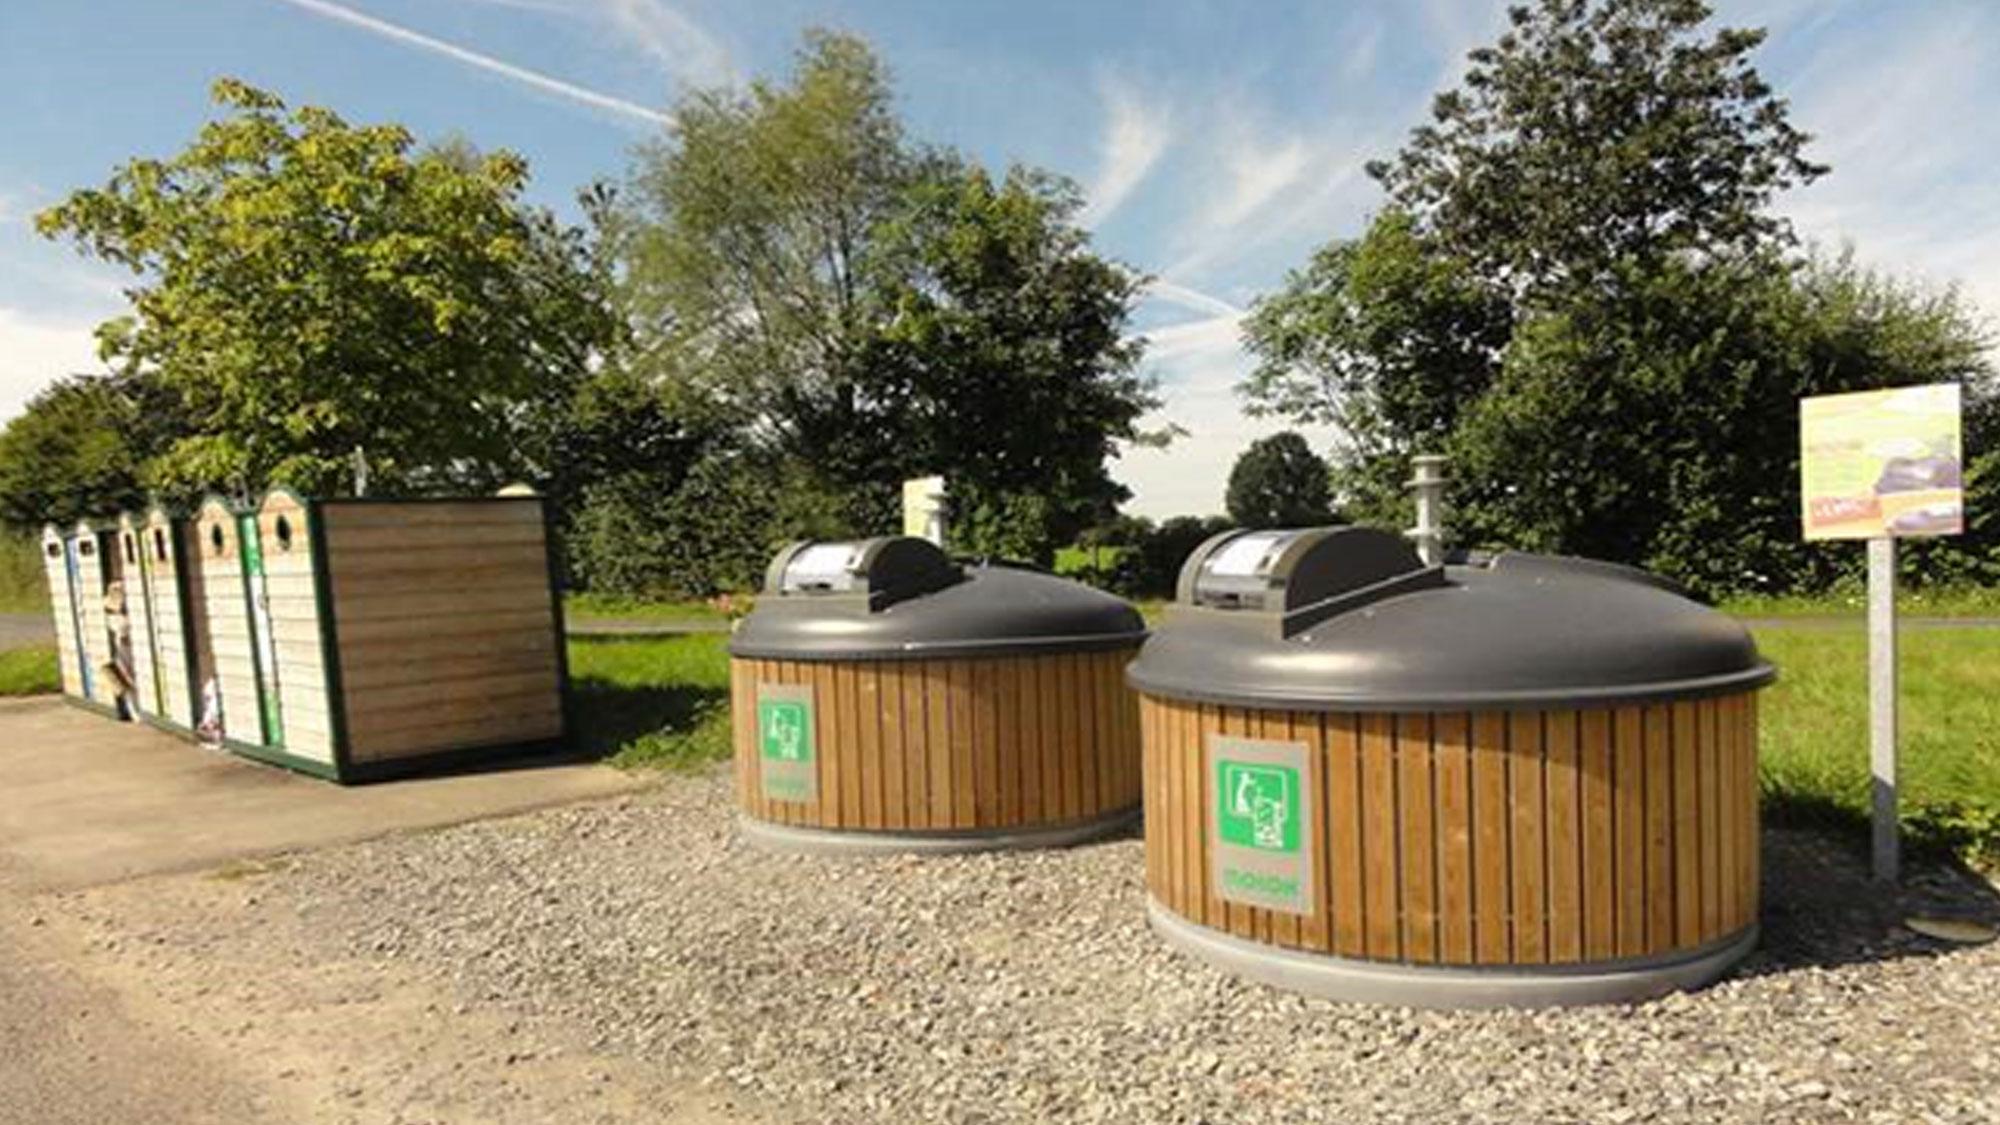 Aix en provence smart waste collection